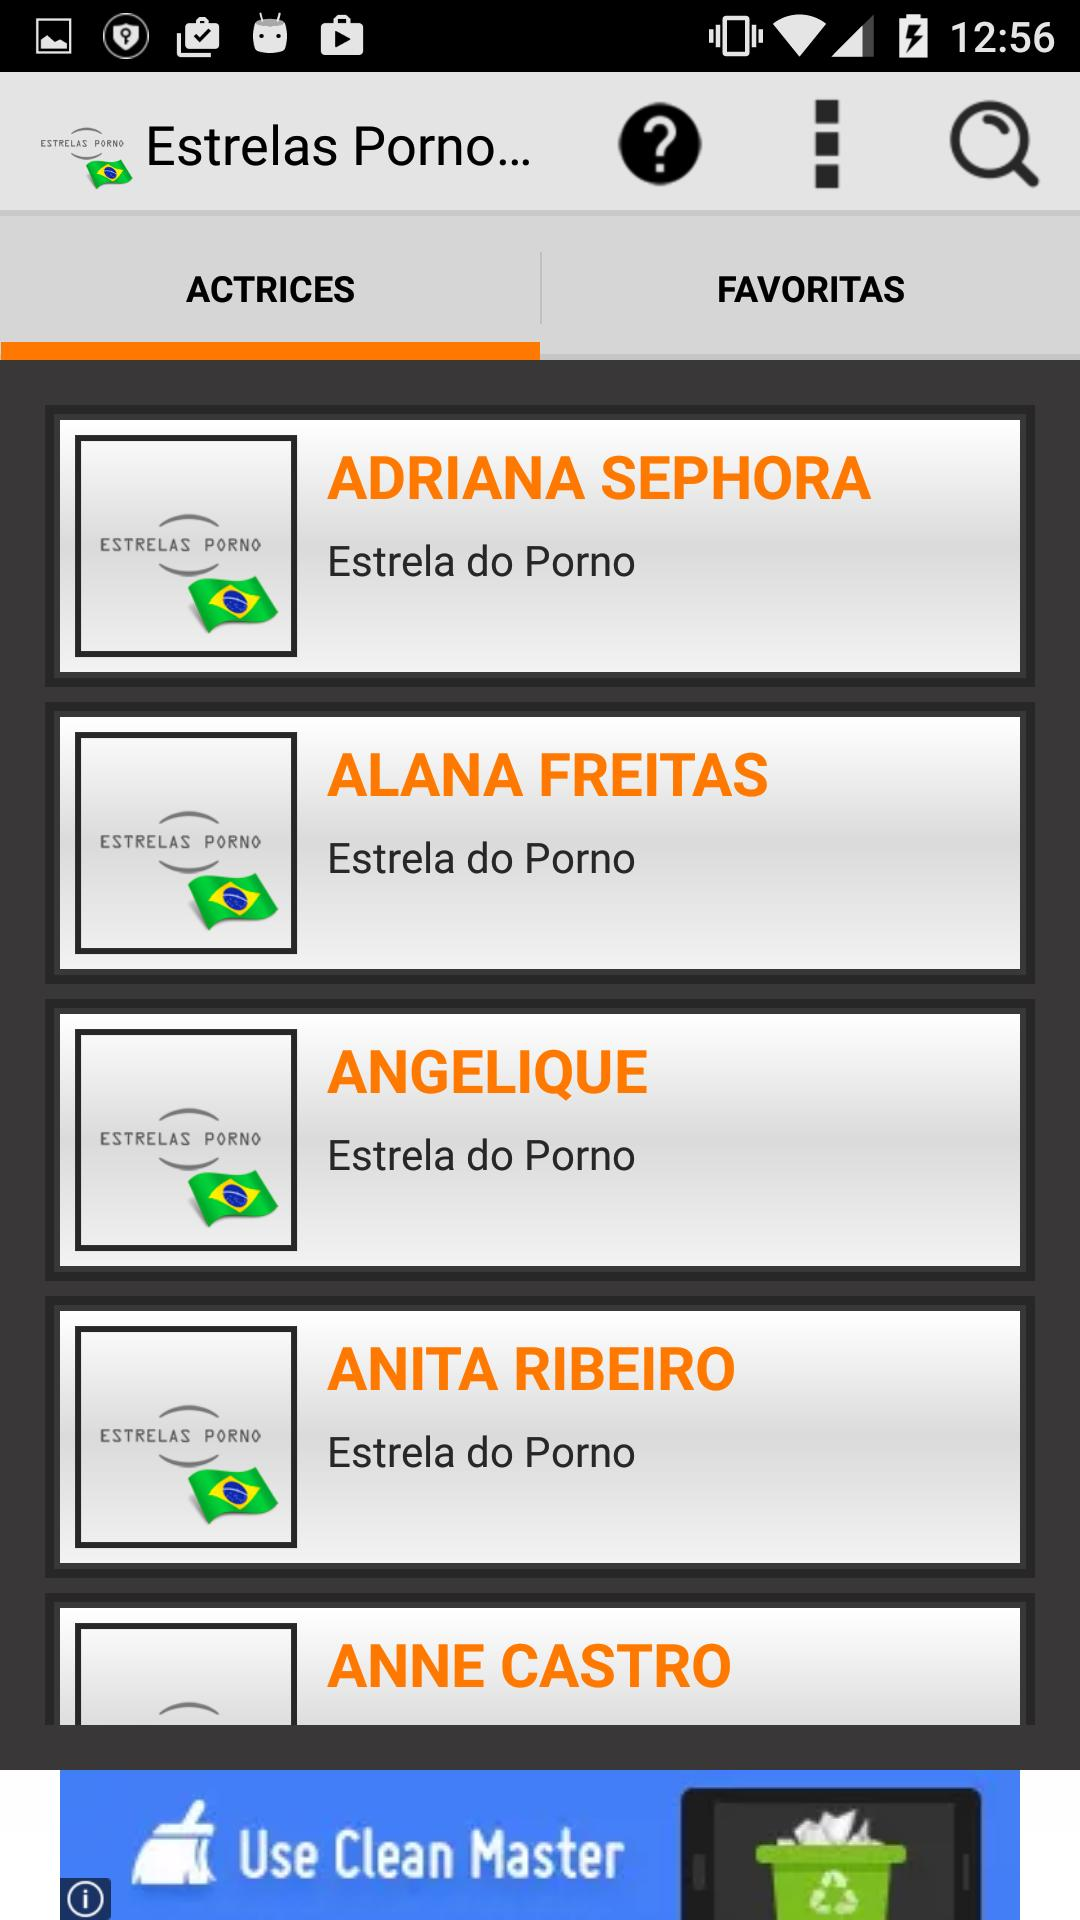 Apps De Porno Android atrizes pornôs no brasil for android - apk download